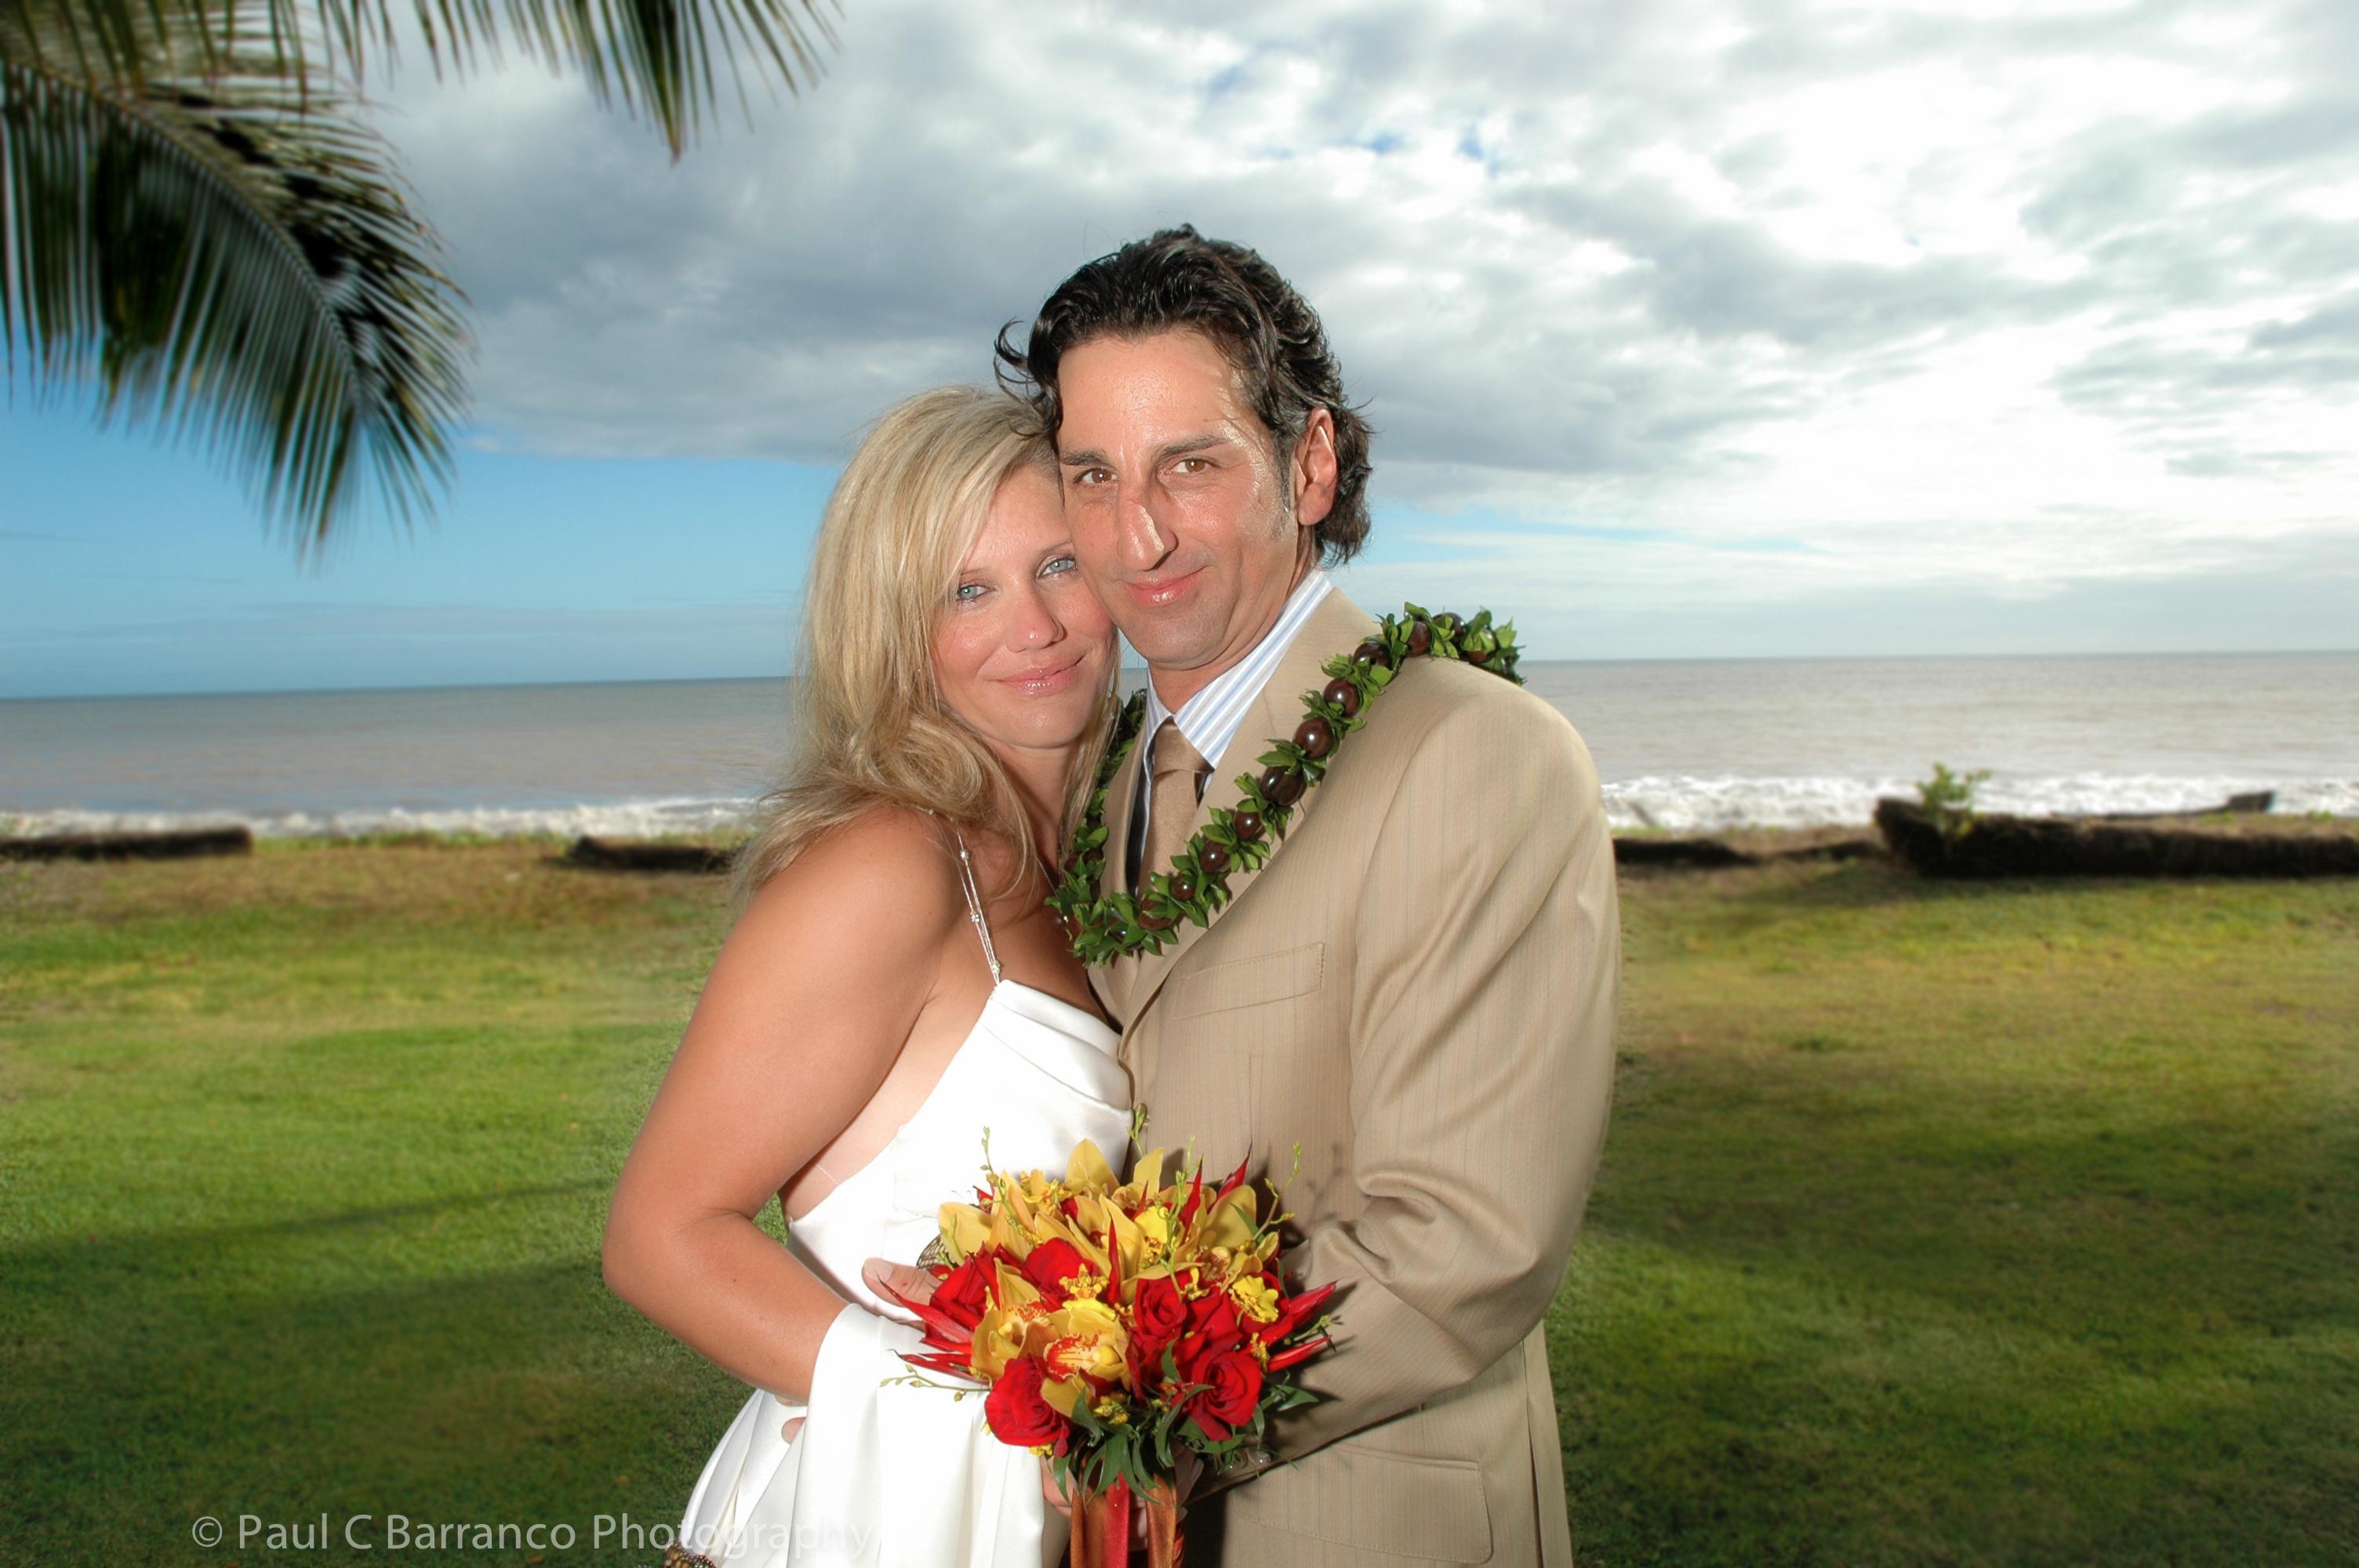 wedding_Port_PCB-2.jpg